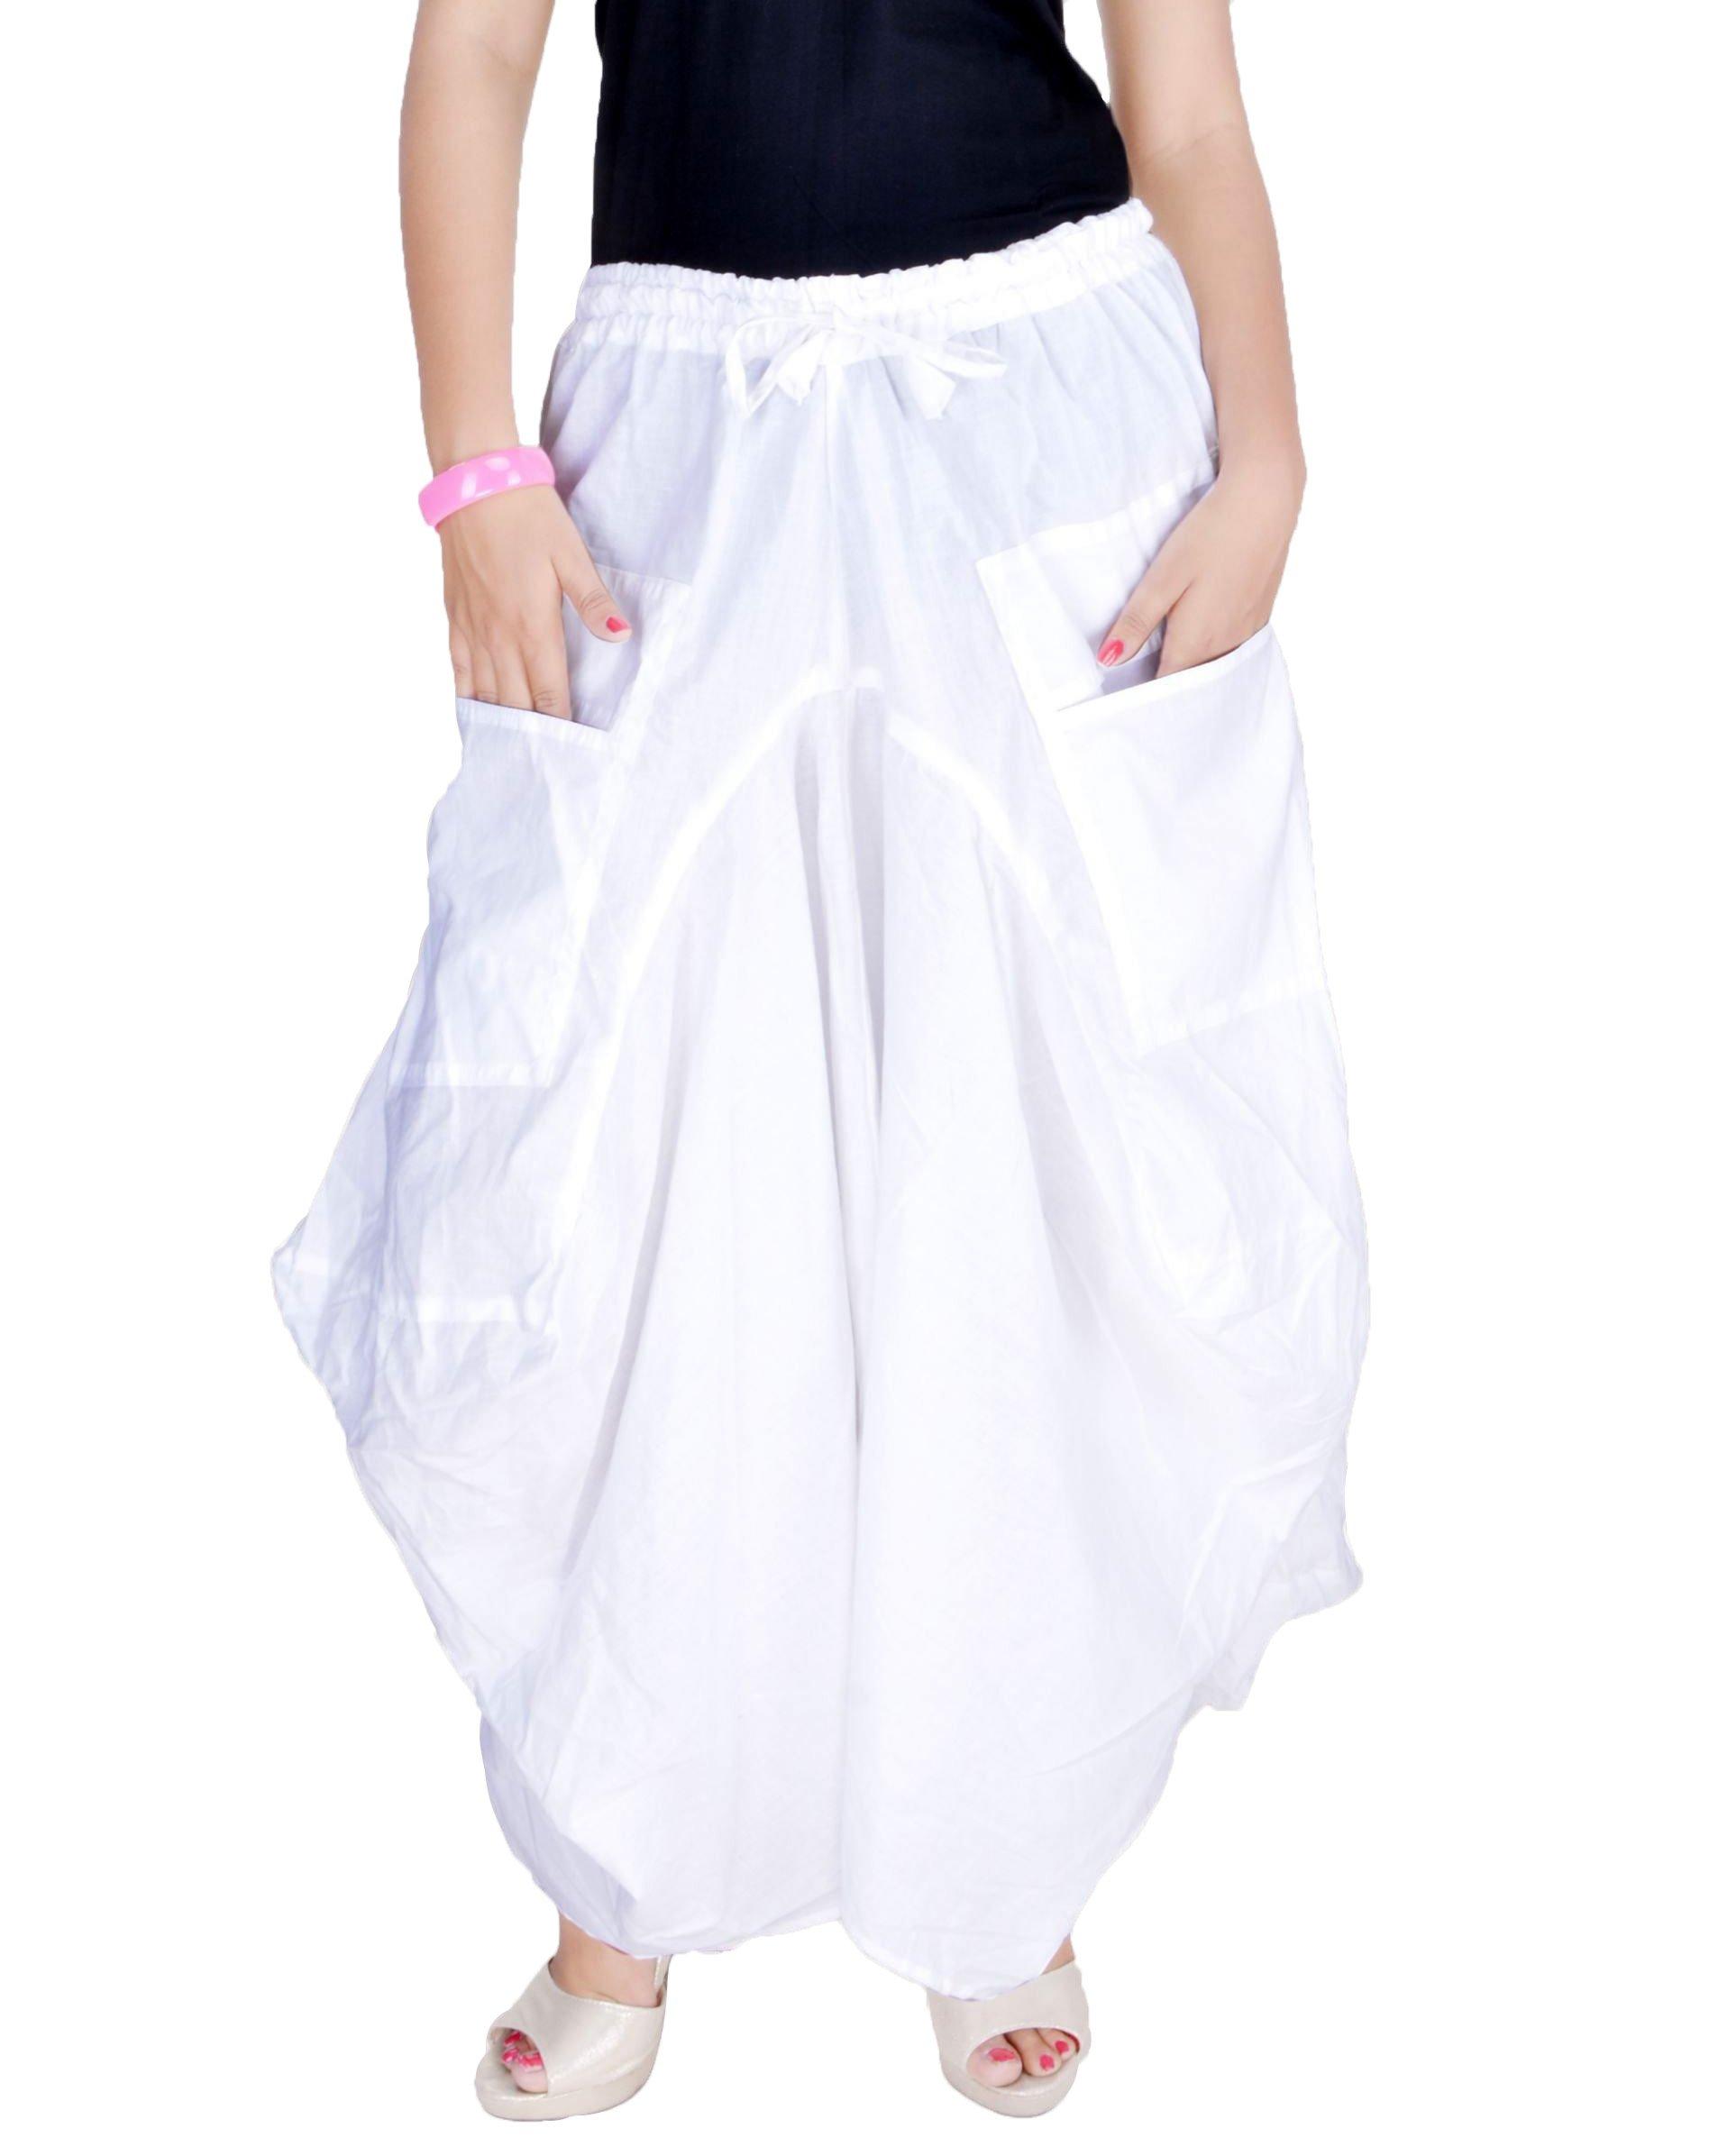 Sarjana Handicrafts Women Cotton Solid Pockets Skirt Hippie Afghani Ethnic (White)